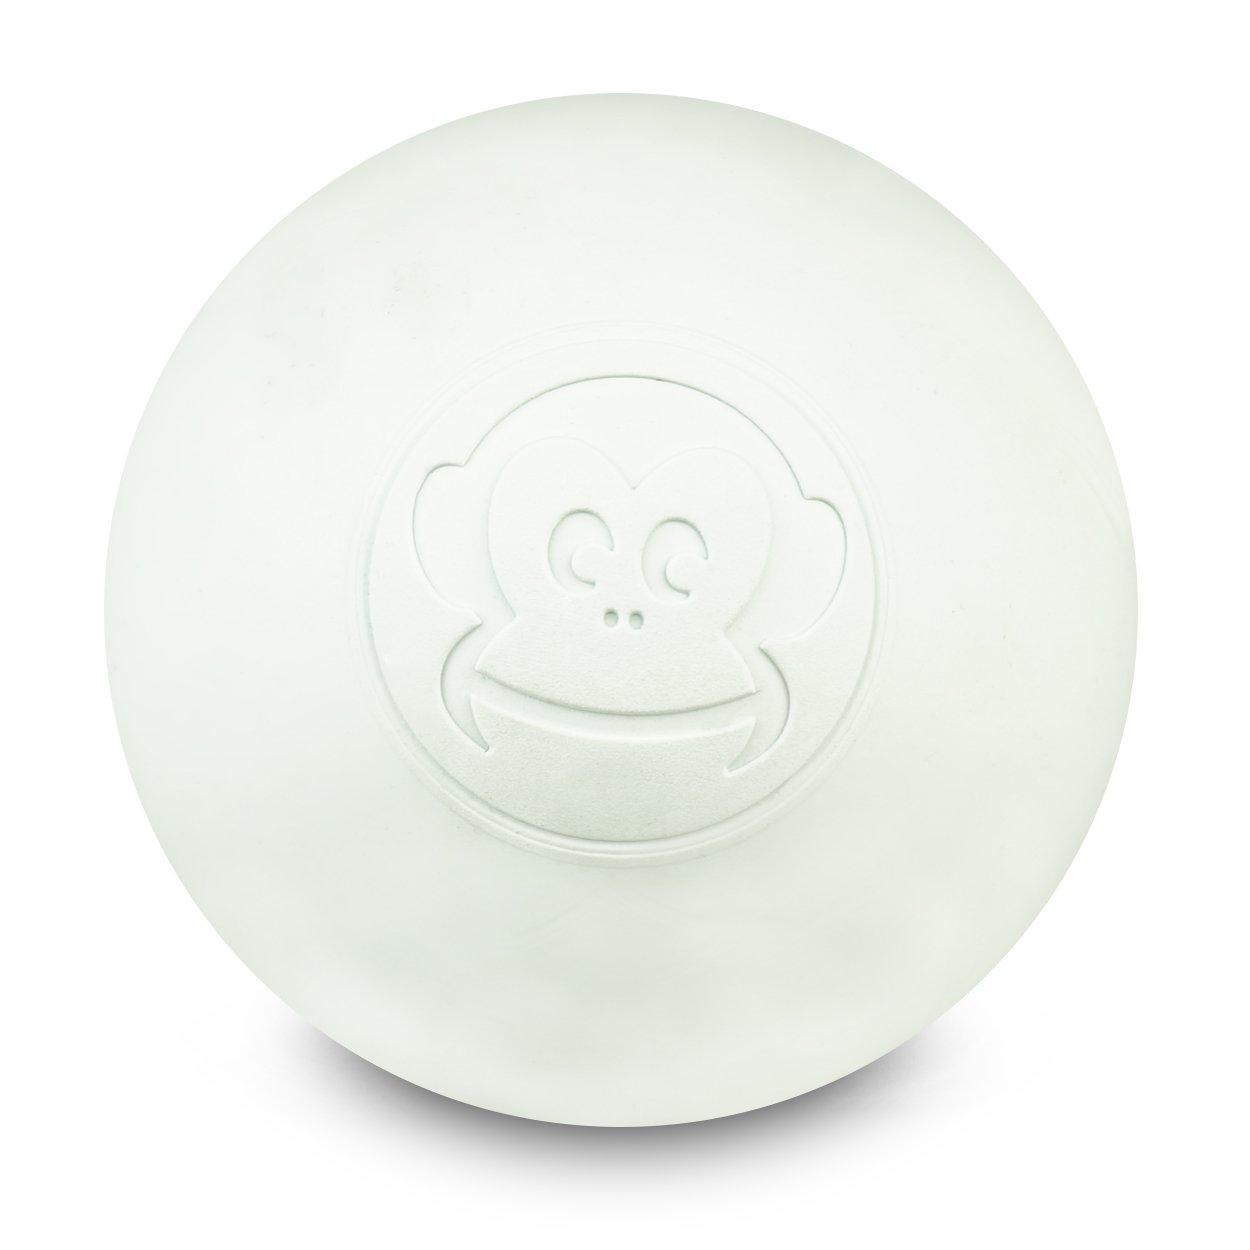 Captain LAX Massageball Original - Lacrosseball in der Farbe Weiß , aus Hartgummi, mit den Maß en 6 x 6 cm geeignet fü r Triggerpunkt- & Faszienmassage/Crossfit